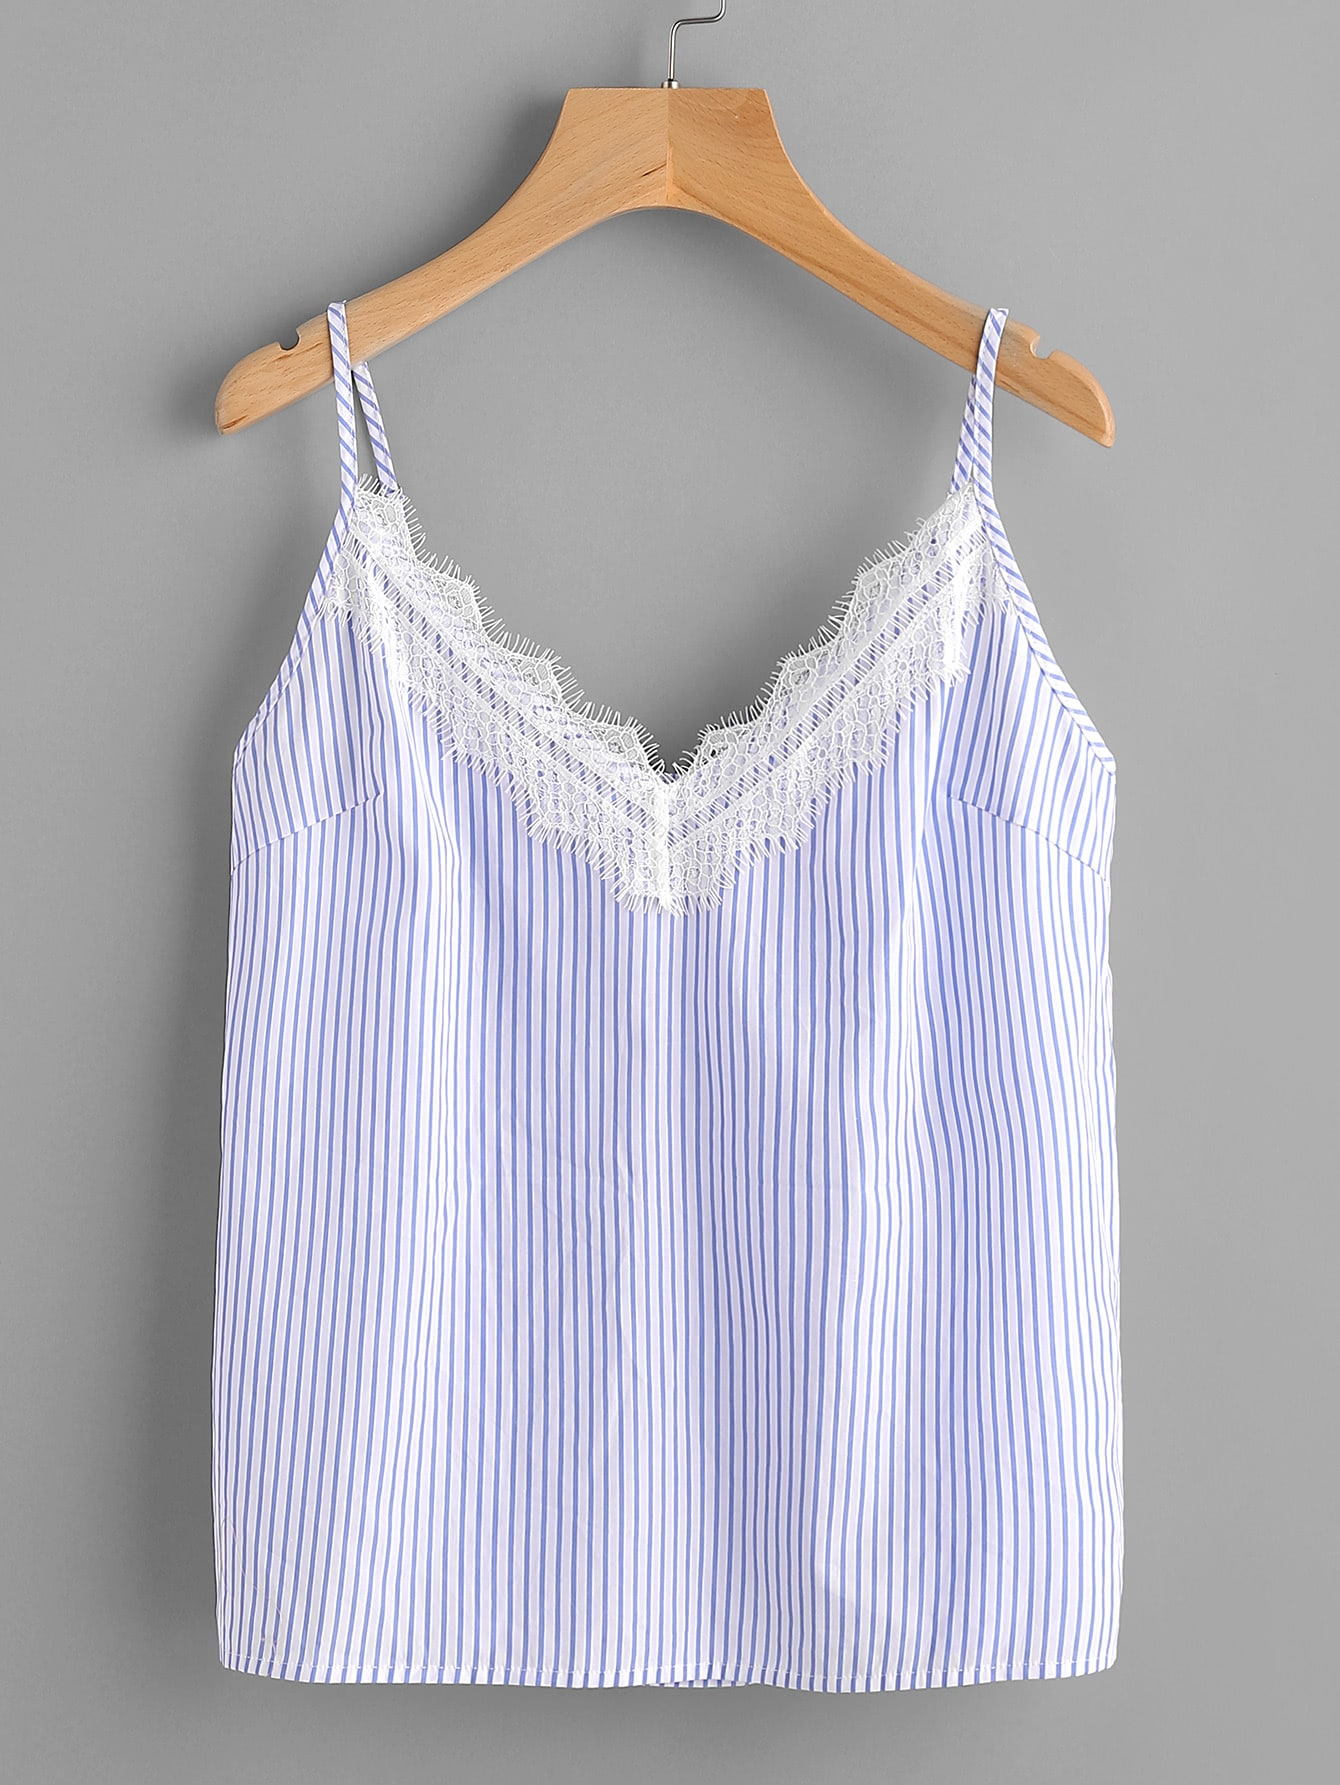 Eyelash Lace Trim Striped Cami Top maison jules 0292 womens gray striped lace trim pullover top shirt xs bhfo